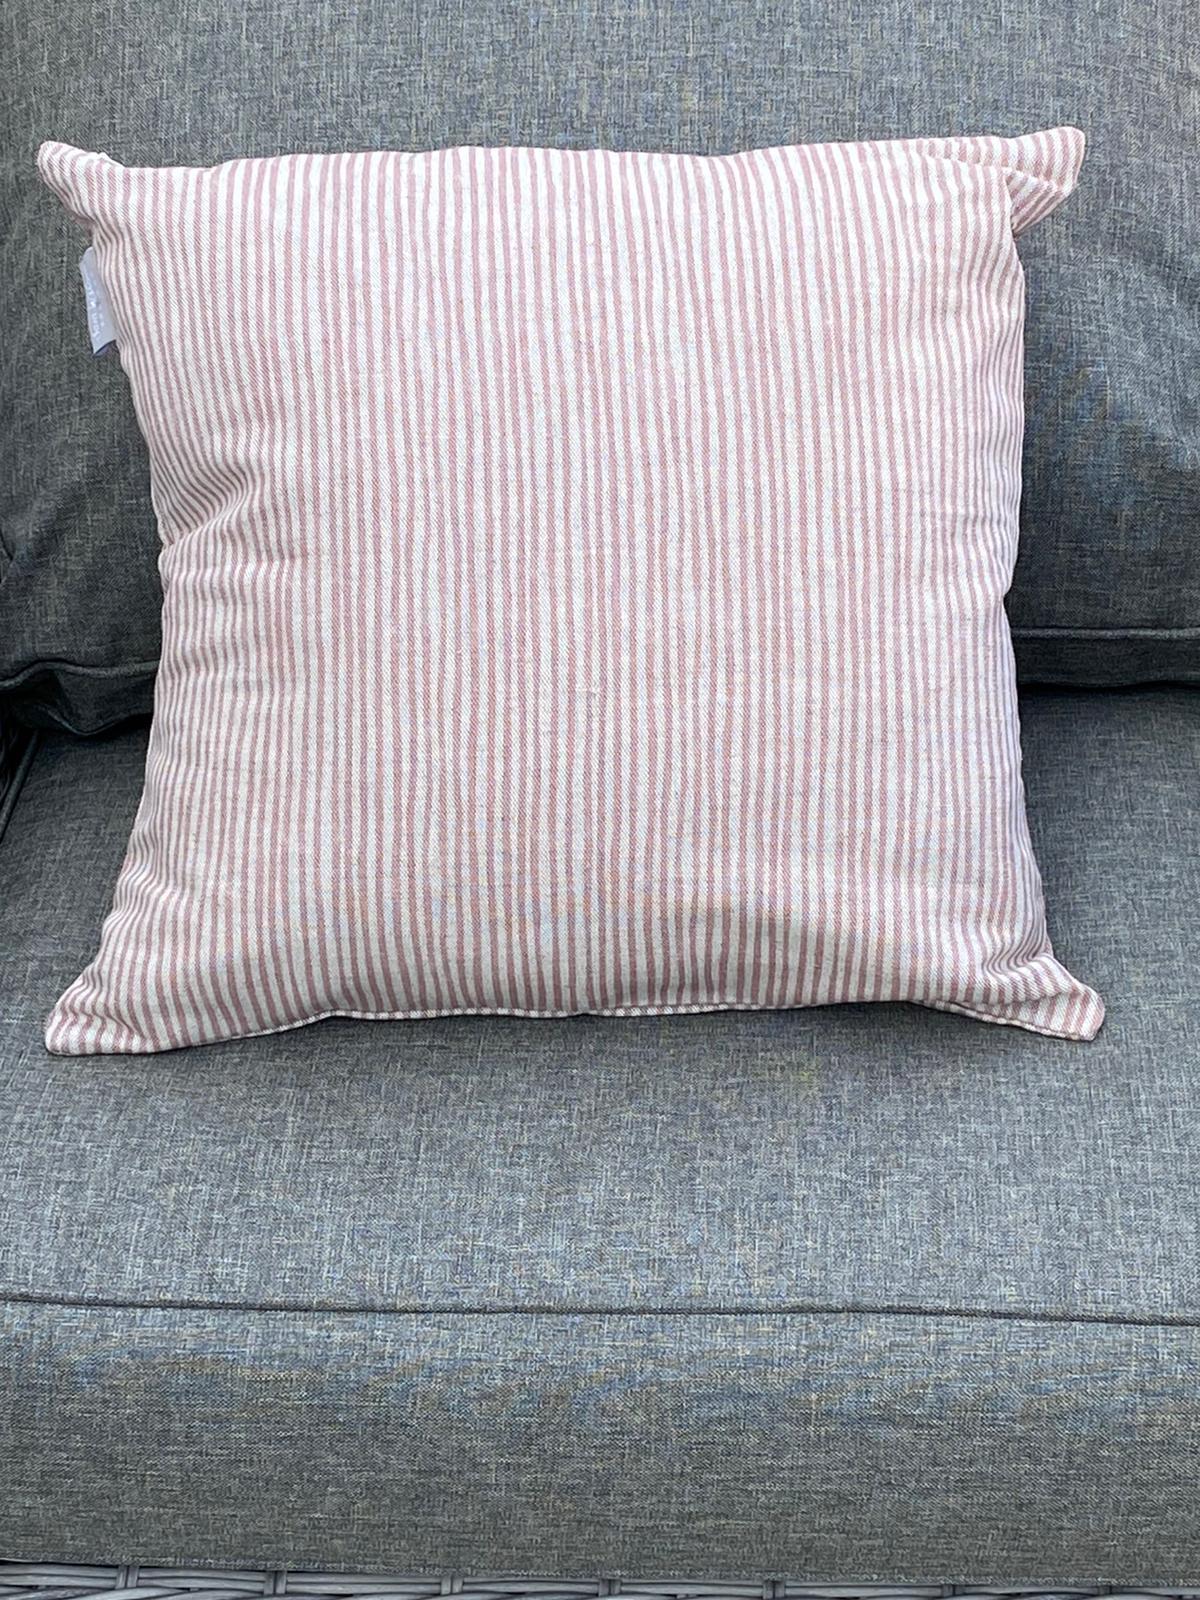 Sam Wilson Feather Cushions - Pink Stripe